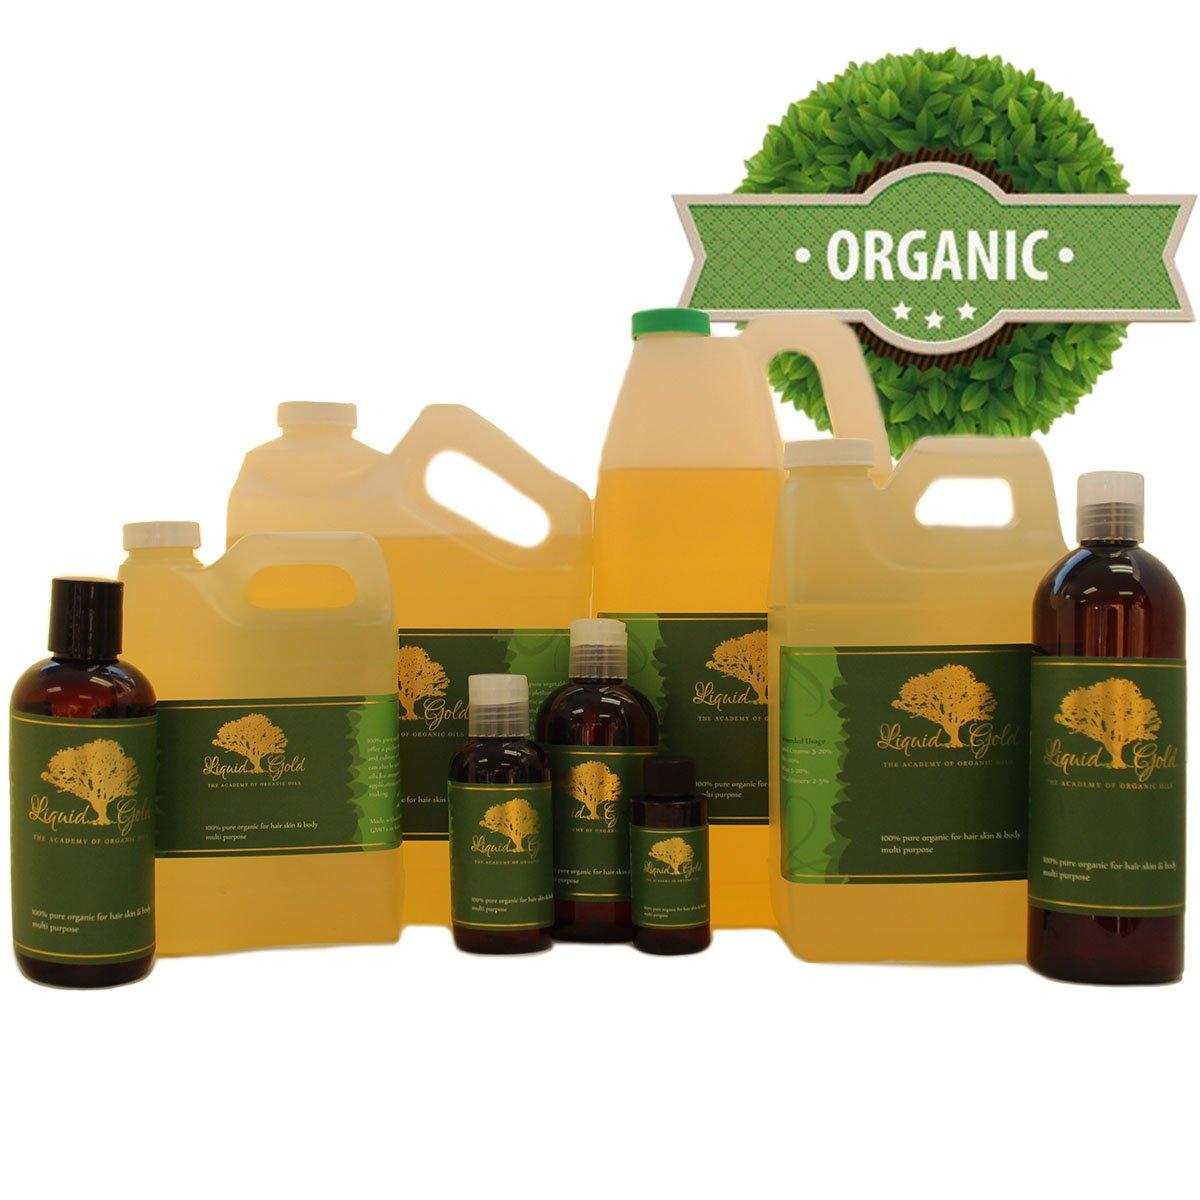 48 Fl.oz Premium Organic Safflower Oil Pure Health Hair Skin Care Moisturizer (3 of 16 Oz bottles) by Liquid Gold